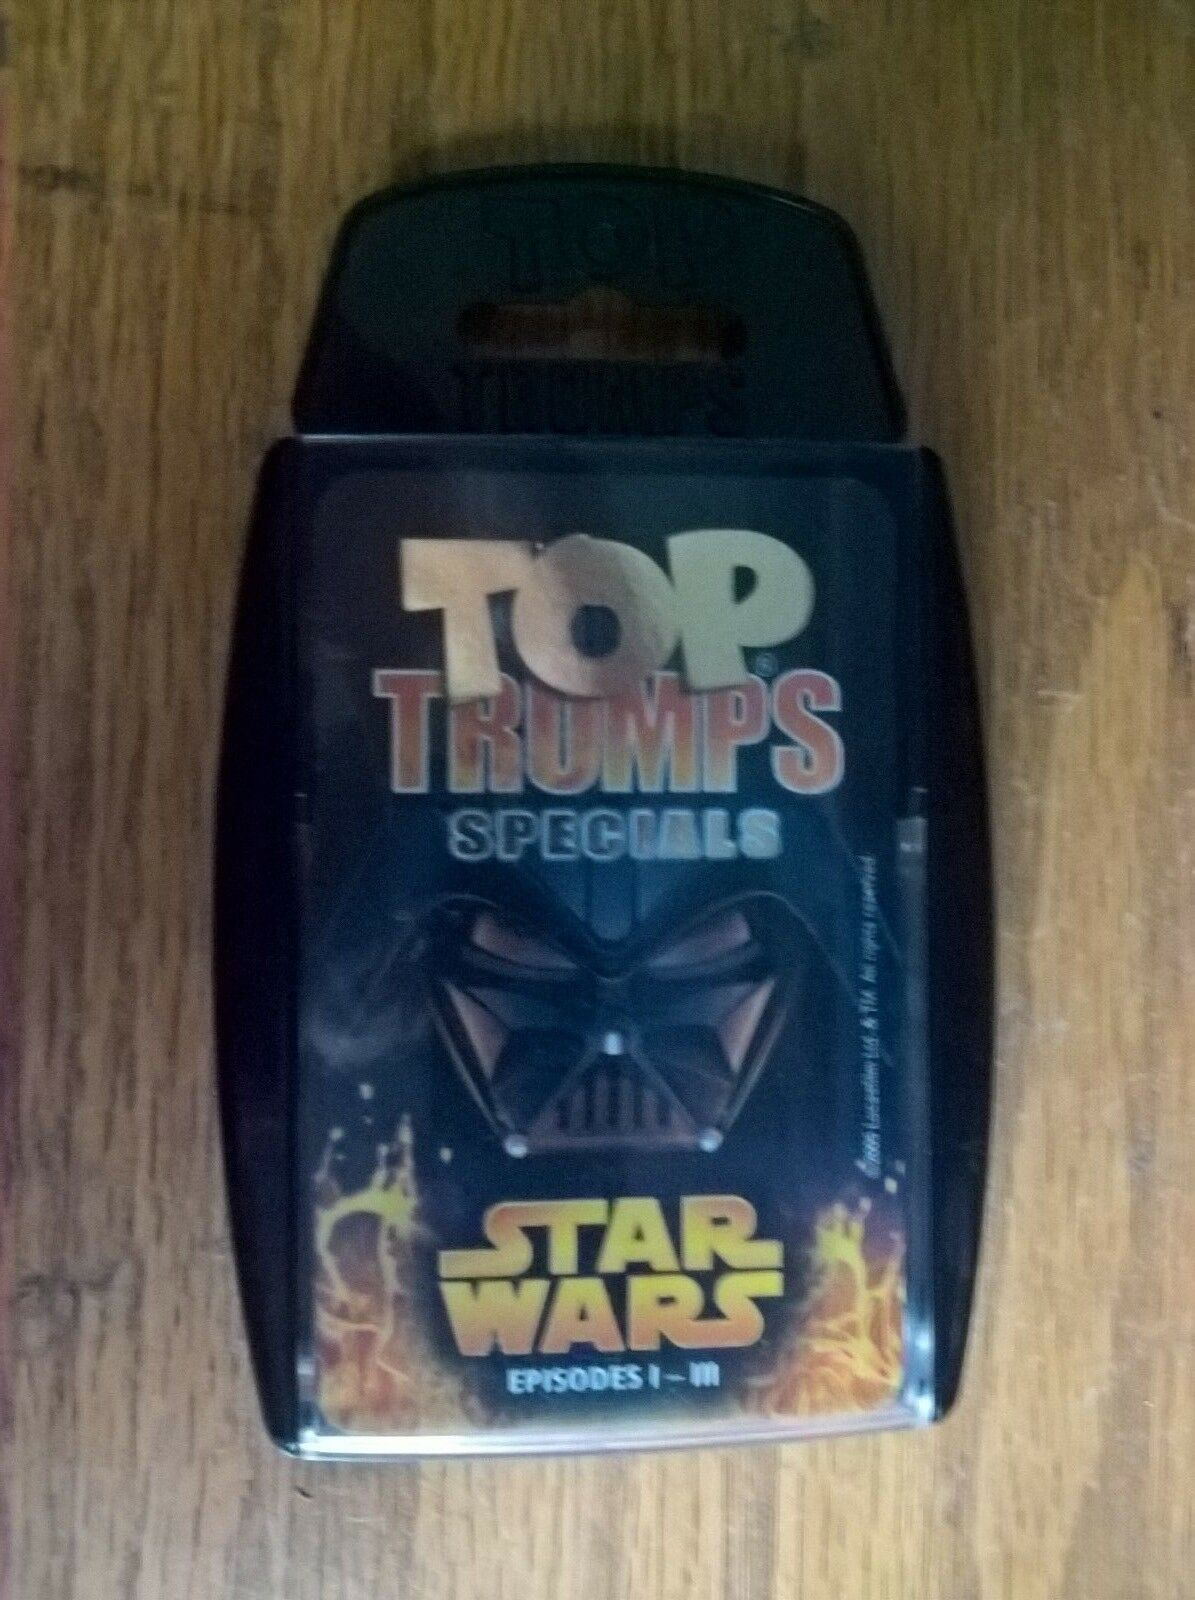 Top Trumps Specials card game set  Wars Star Wars  Episodes I-III dc255a